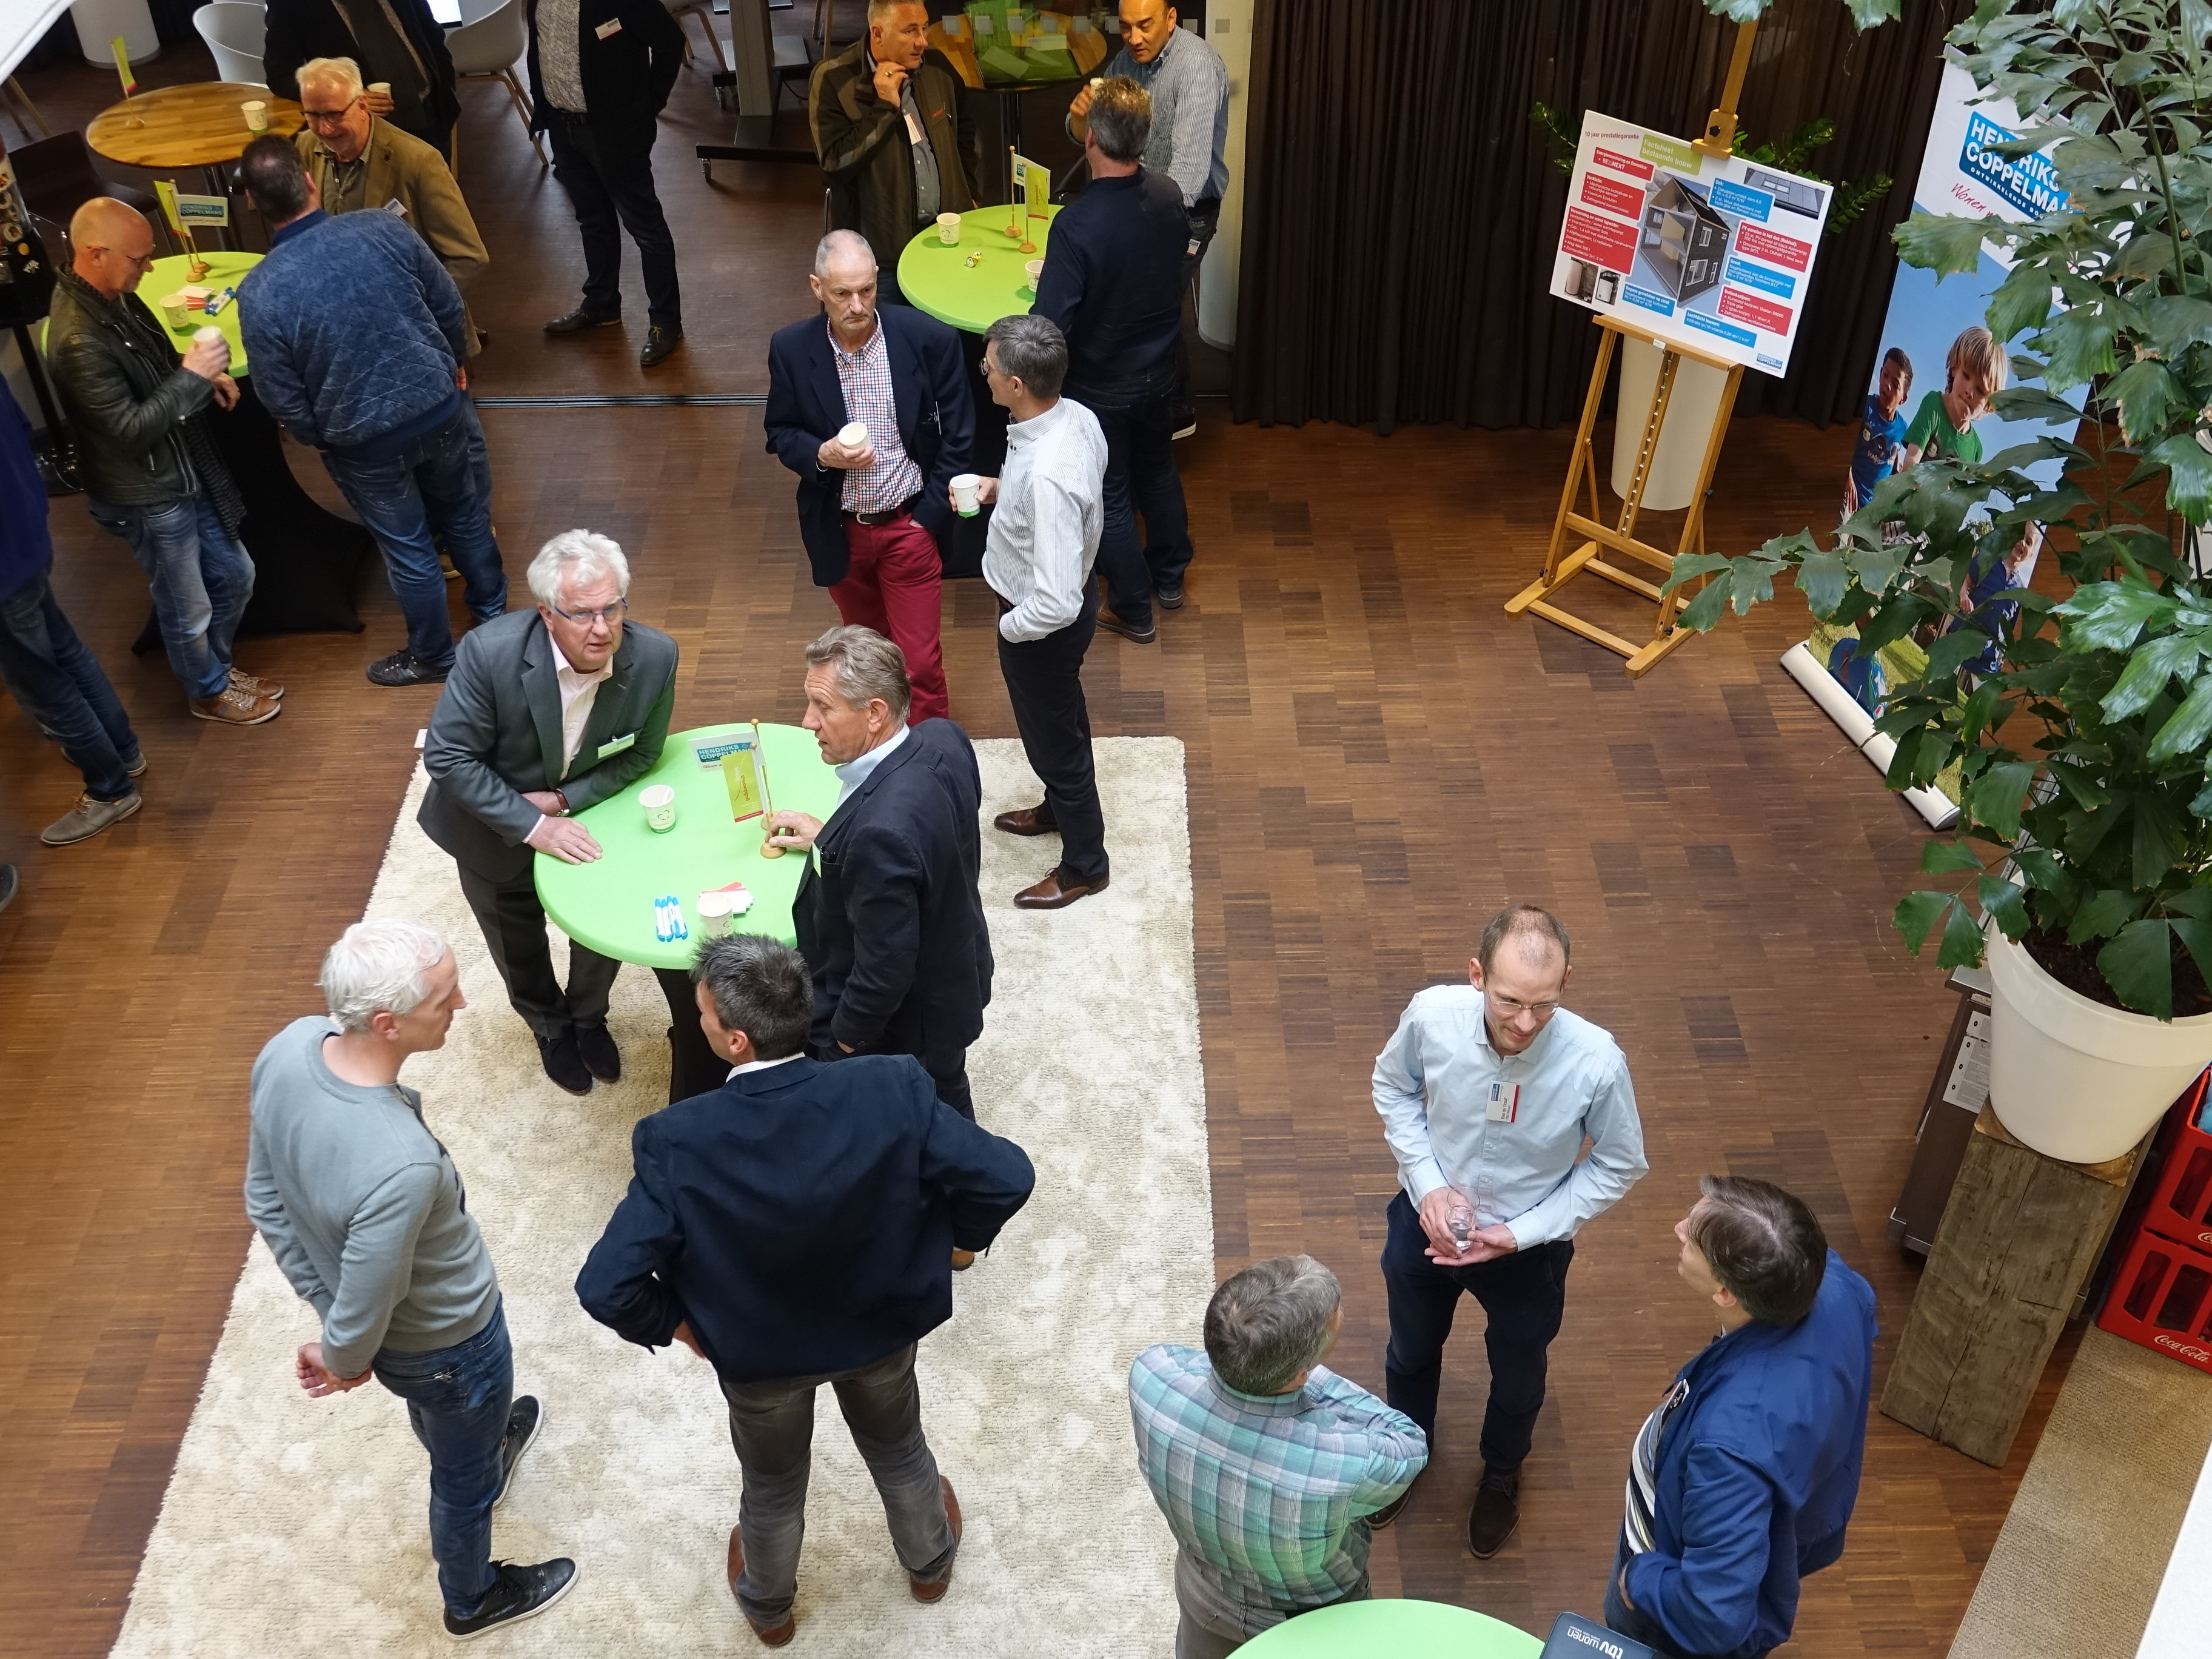 Enthousiasme tijdens NOM-renovatie praktijkmiddag in Deurne